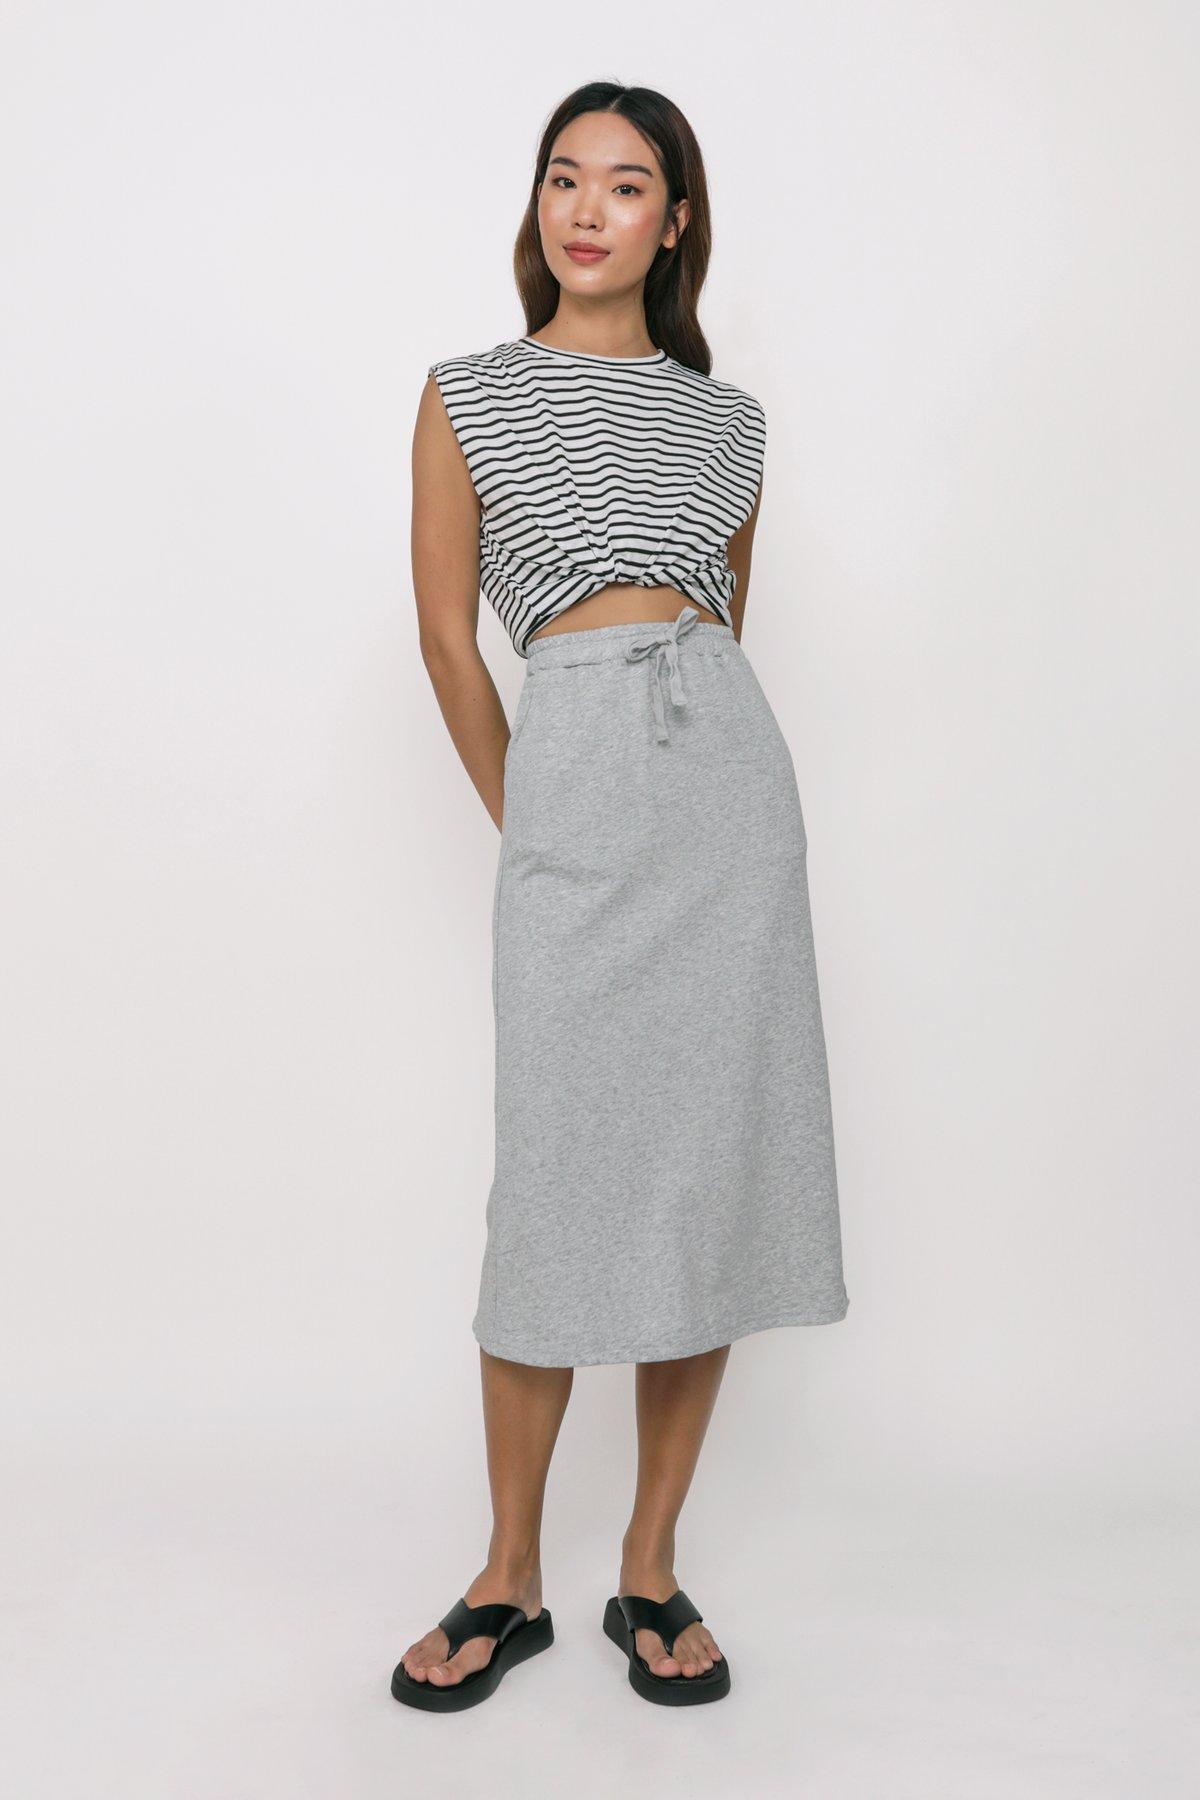 Nic Jersey Cotton Midi Skirt (Grey)